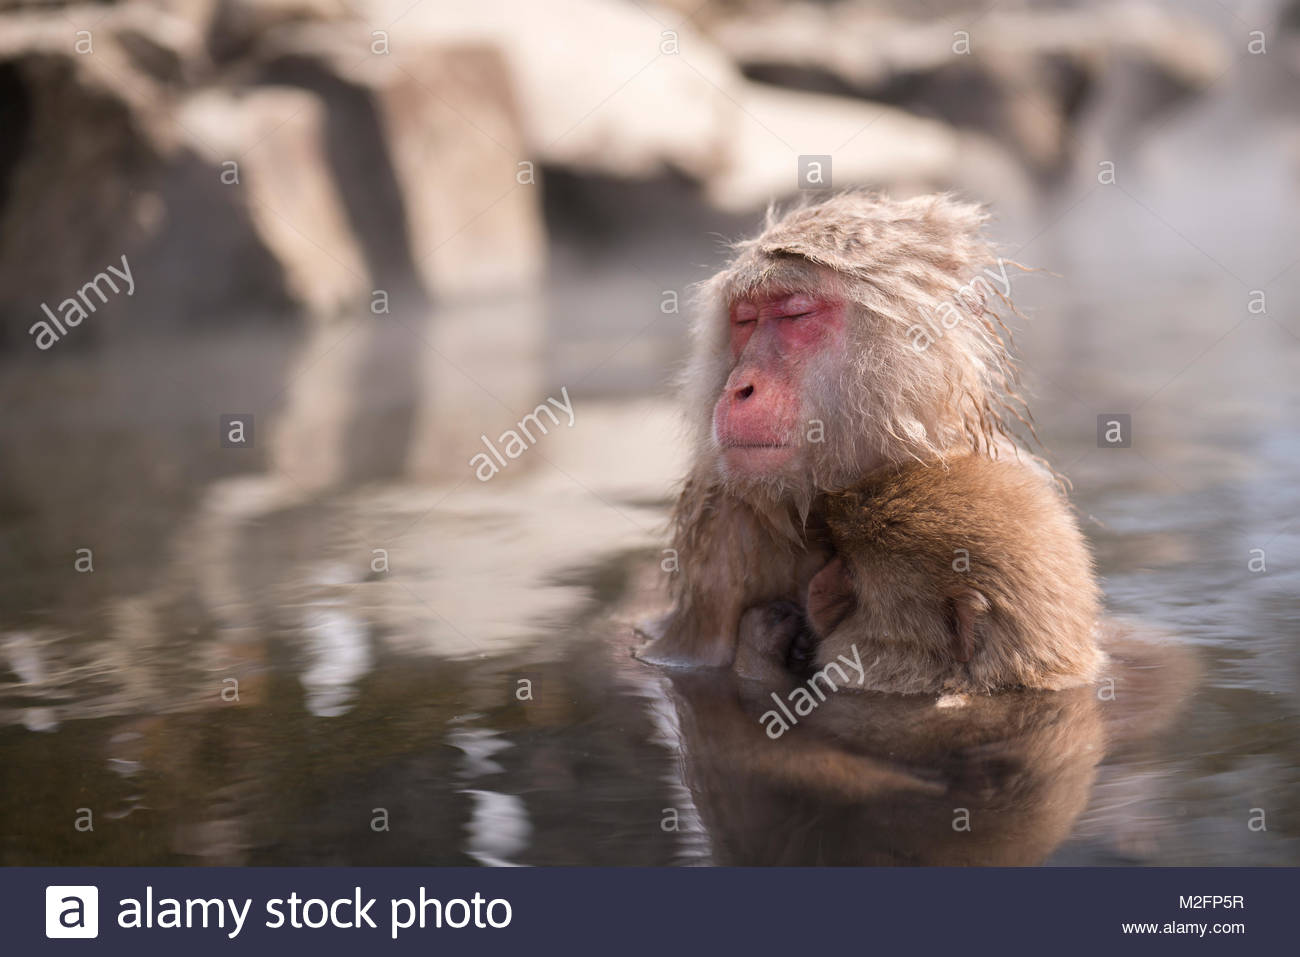 Snow monkey enters a hot spring, at Jigokudani Snow monkey in Nagano, Japan. Stock Photo